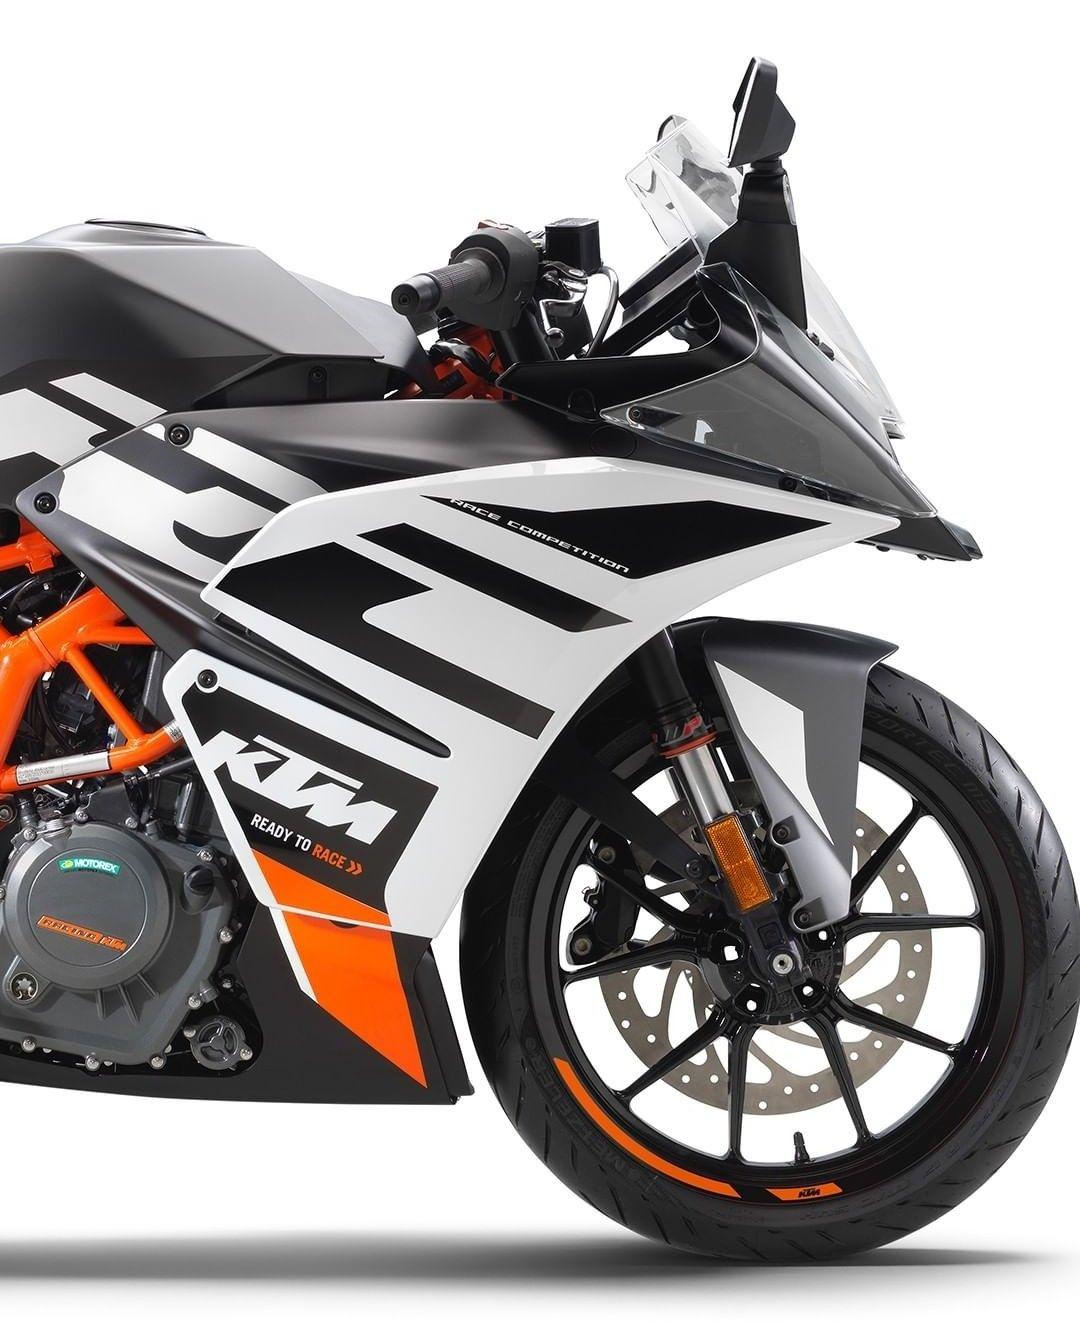 KTM RC 390, Top 10 Sports bike of 2020 in 2020 Ktm rc